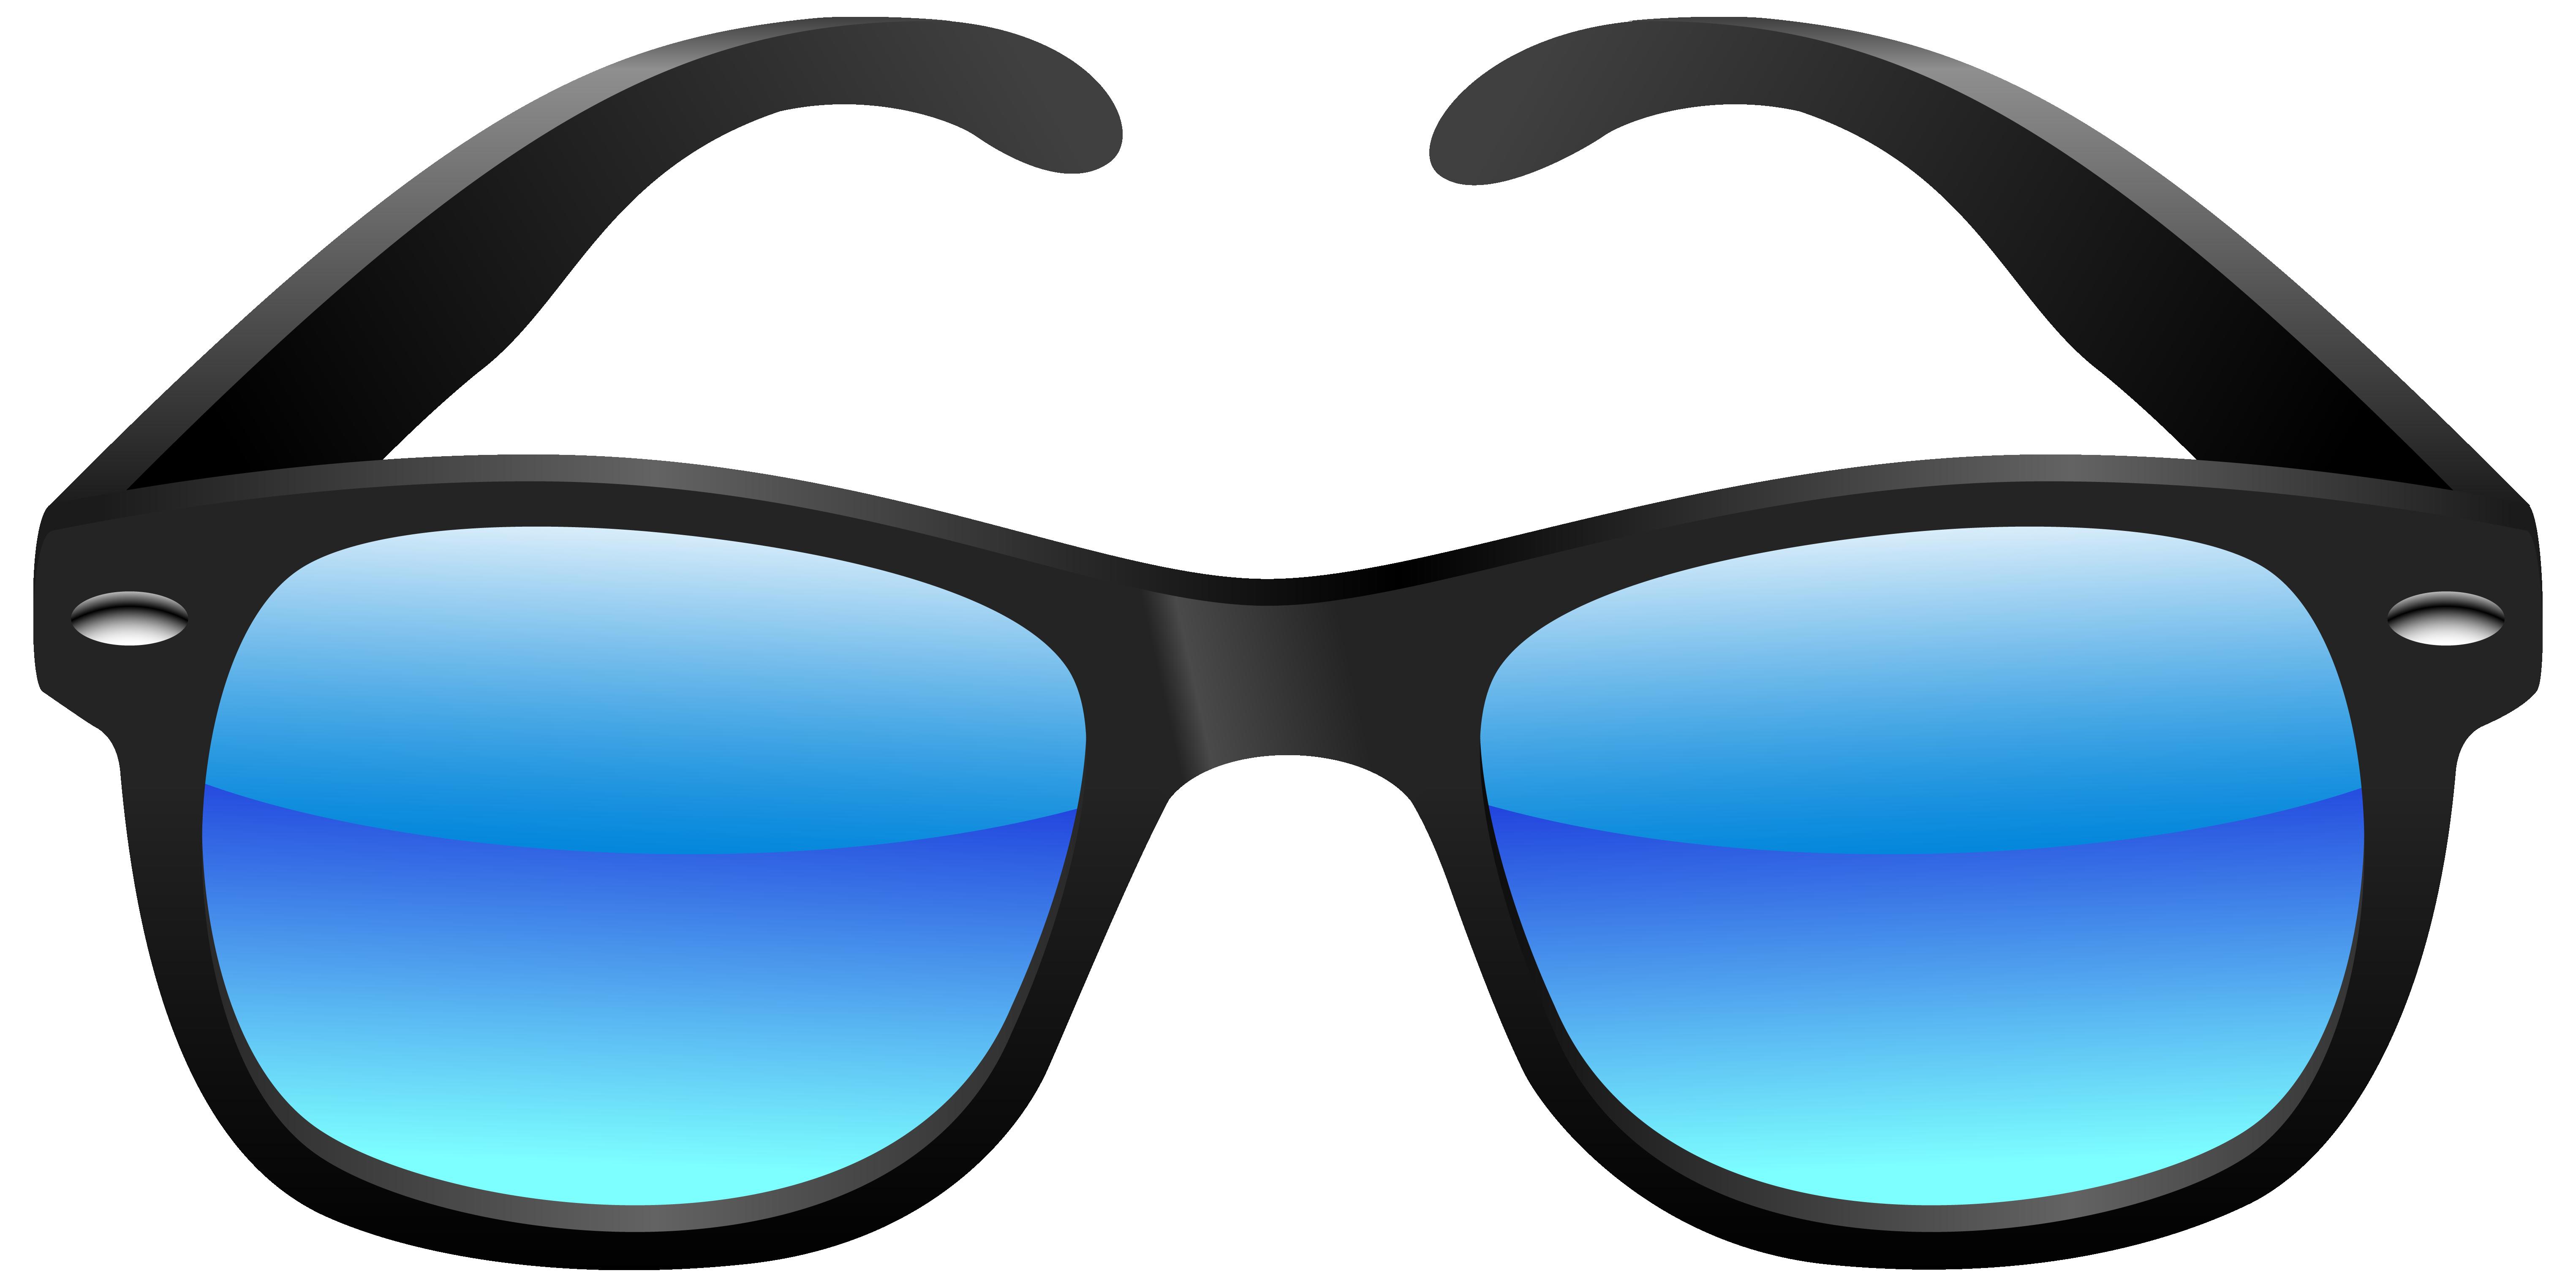 6099x3047 Sunglasses Clipart Download